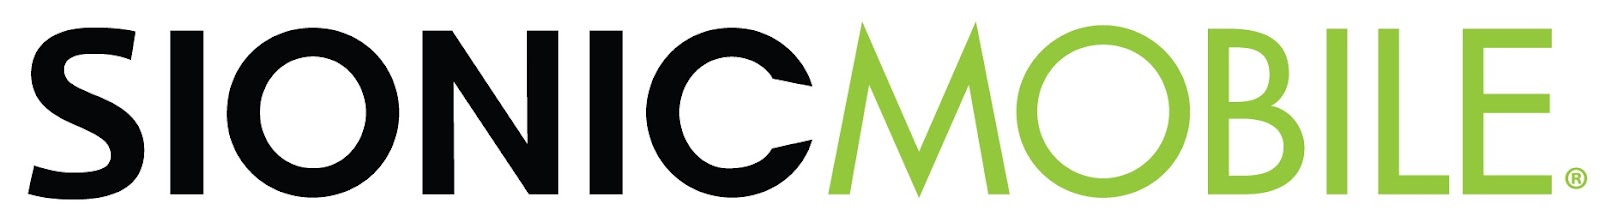 Sionic Mobile Logo_Black and Green - RGB (002).jpg